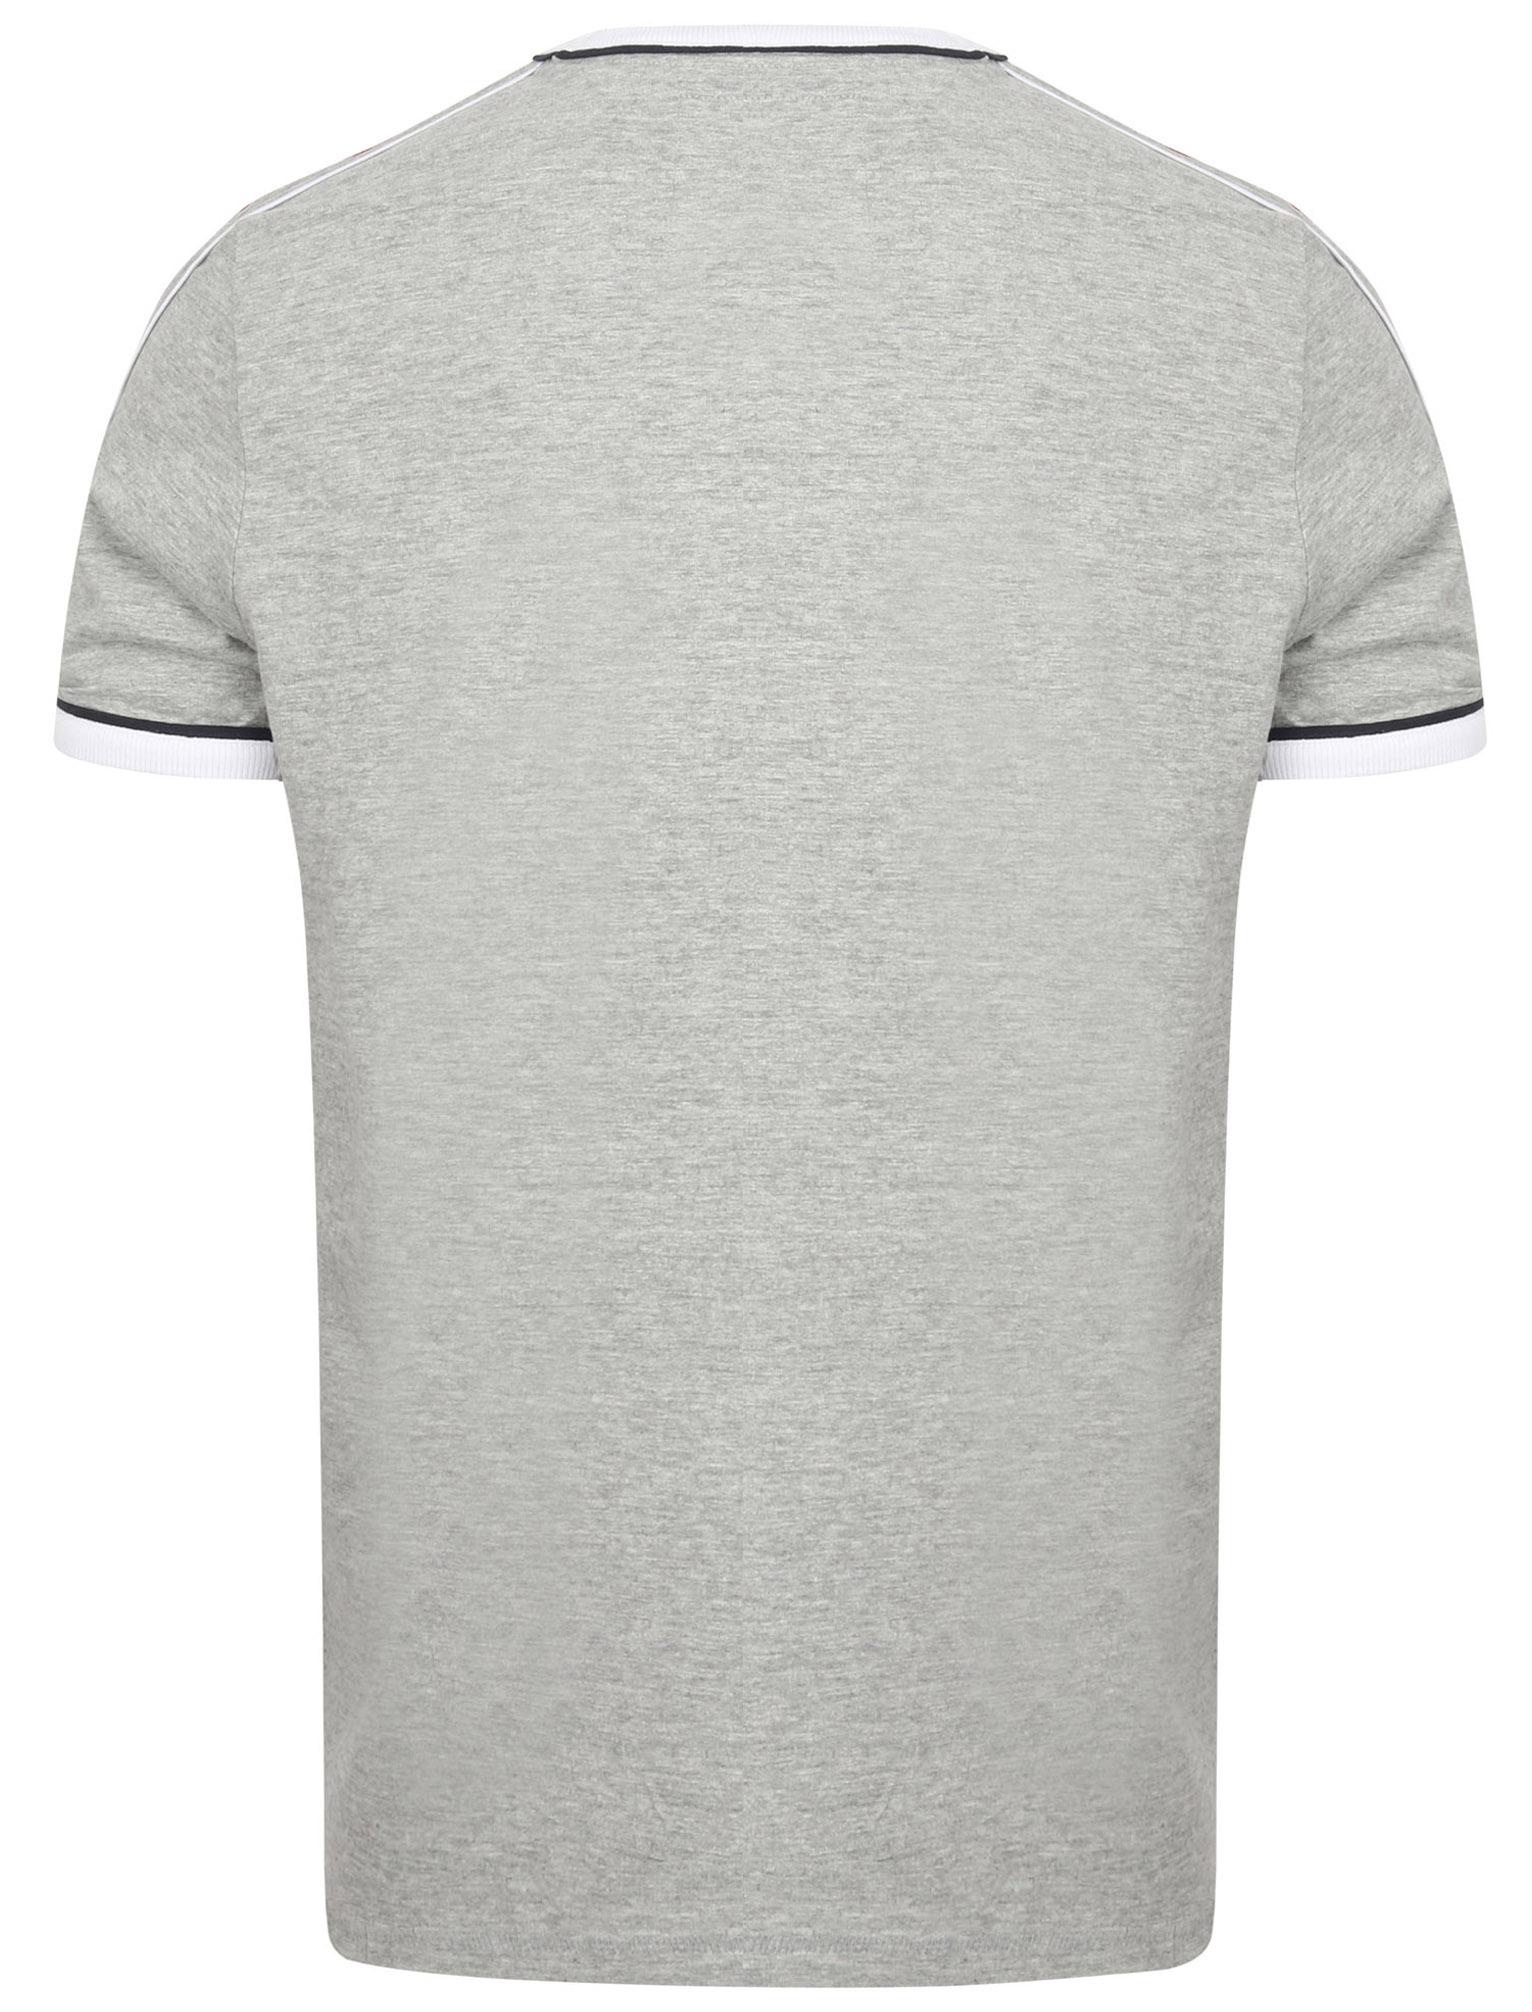 New-Mens-Tokyo-Laundry-Huson-Contrast-Crew-Neck-Cotton-Rich-T-Shirt-Size-S-XXL thumbnail 5